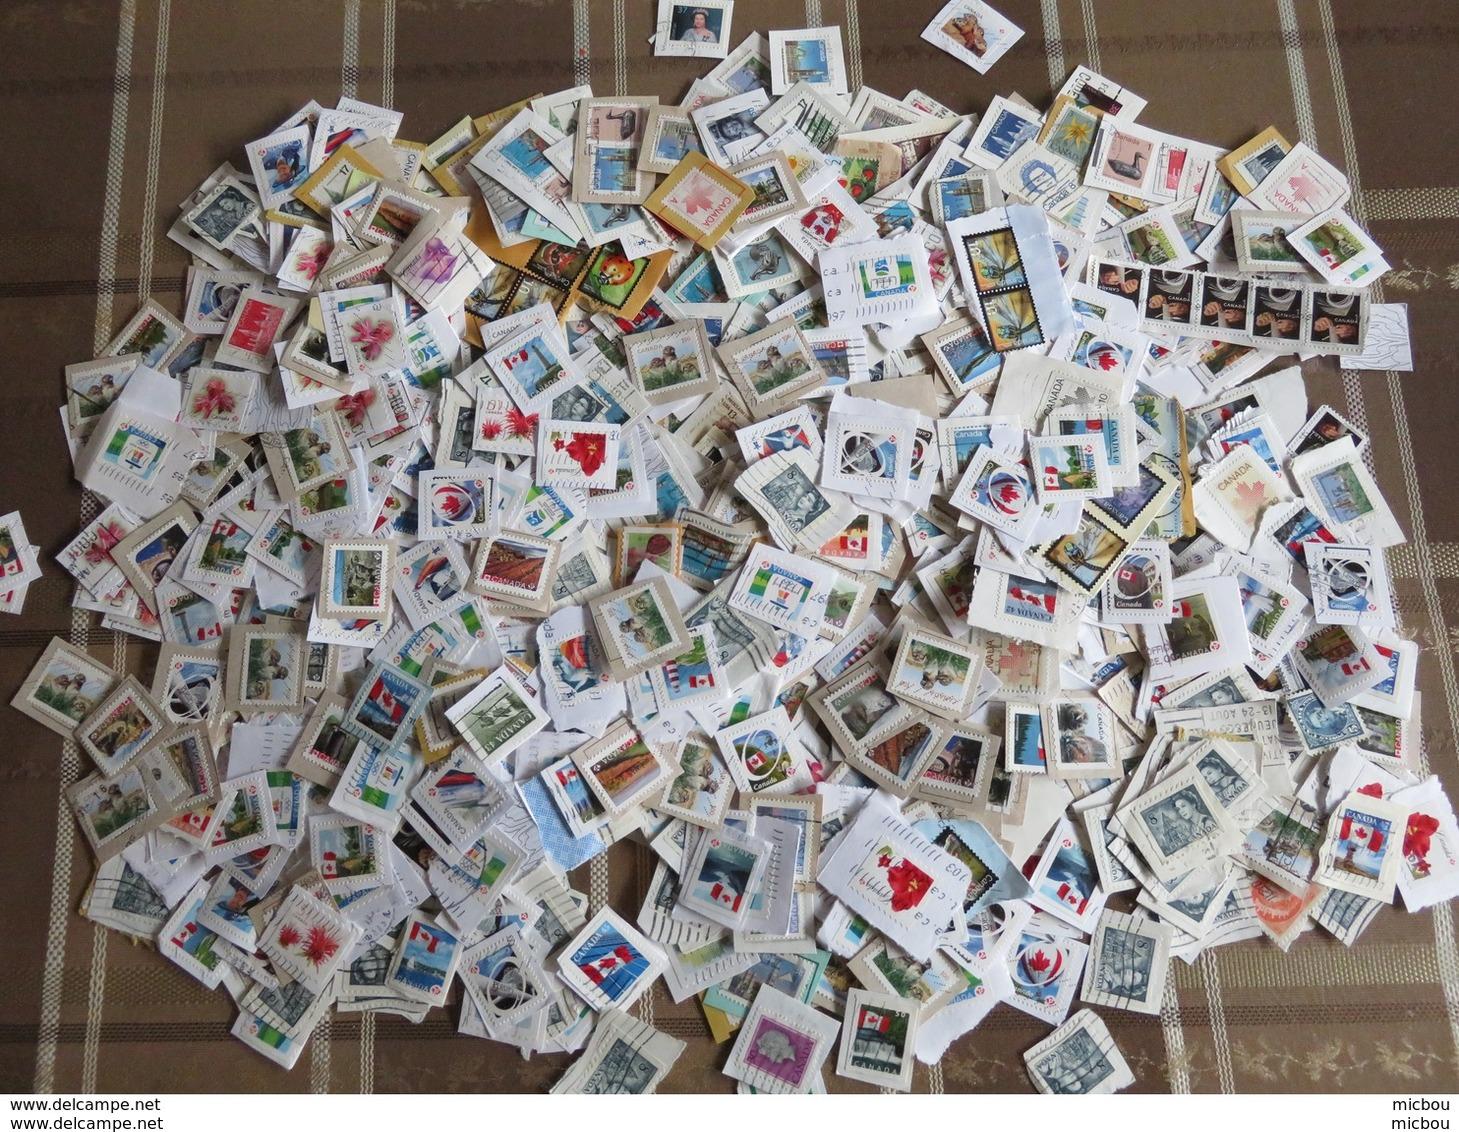 ##S2, Canada, Vrac, Plus De 1000 Timbres Diversifiée, More Than 1000 Diversified Stamps - Timbres